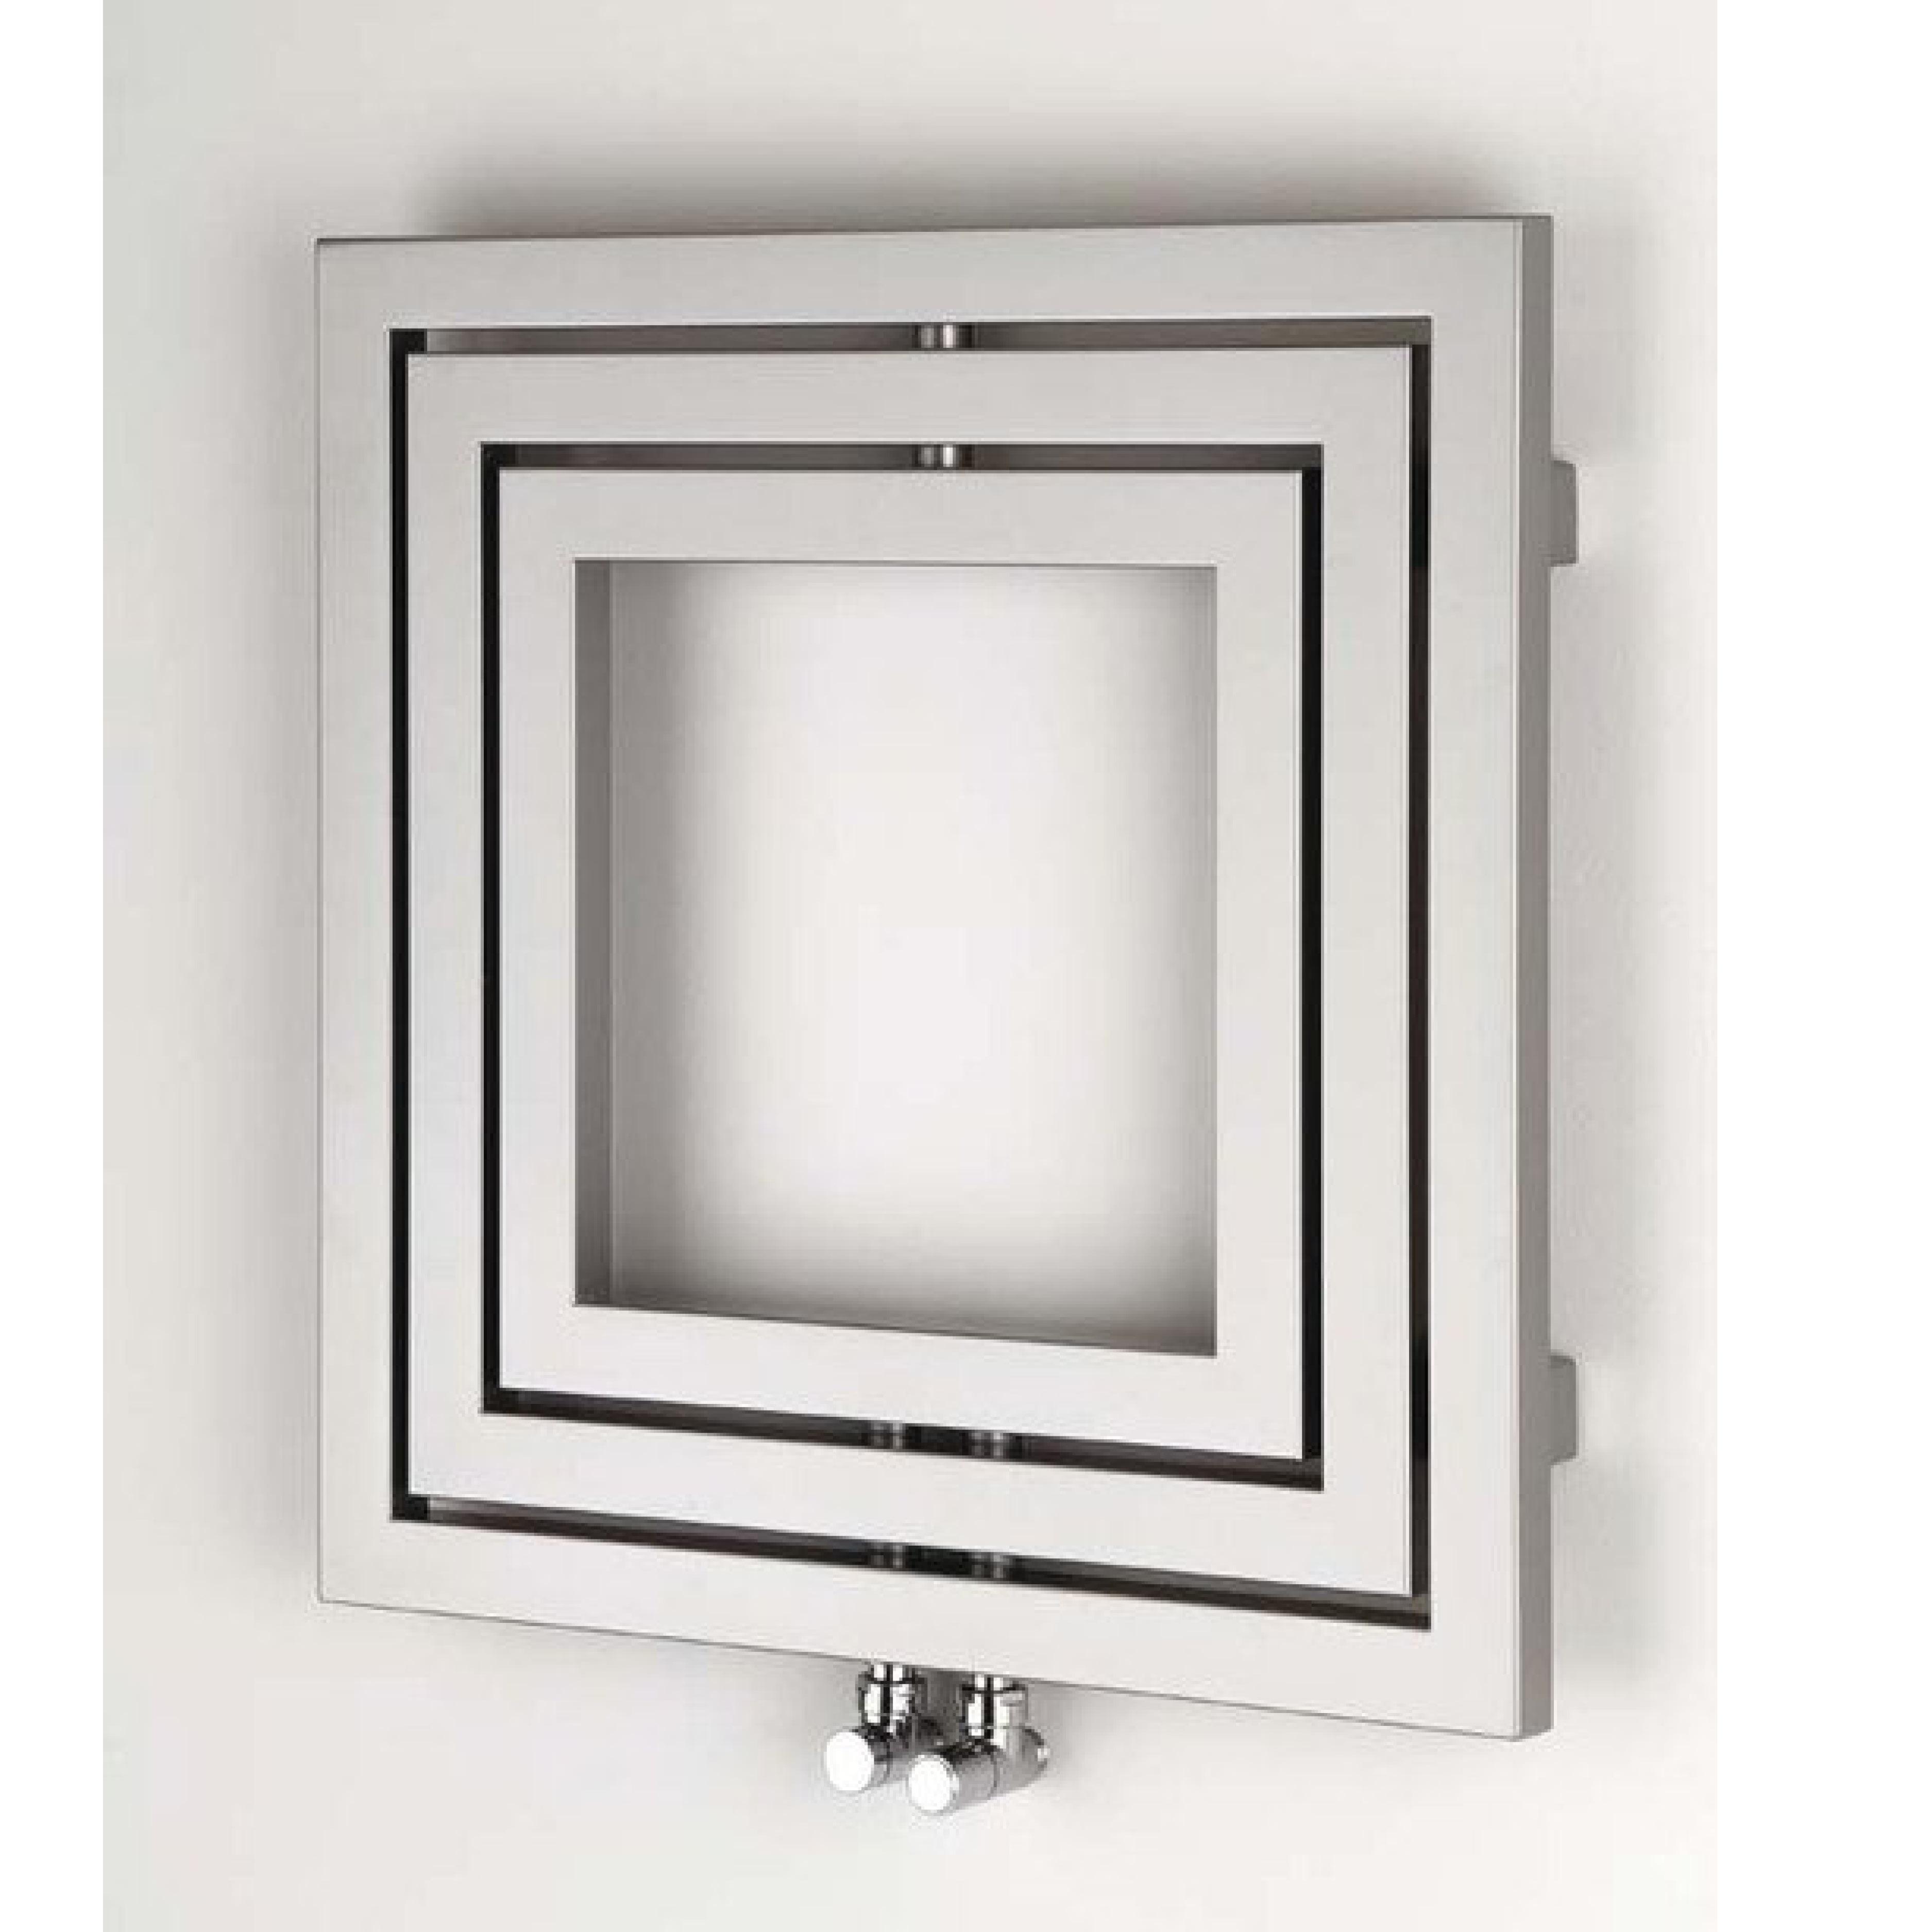 radiateur eau chaude libra aquabains. Black Bedroom Furniture Sets. Home Design Ideas